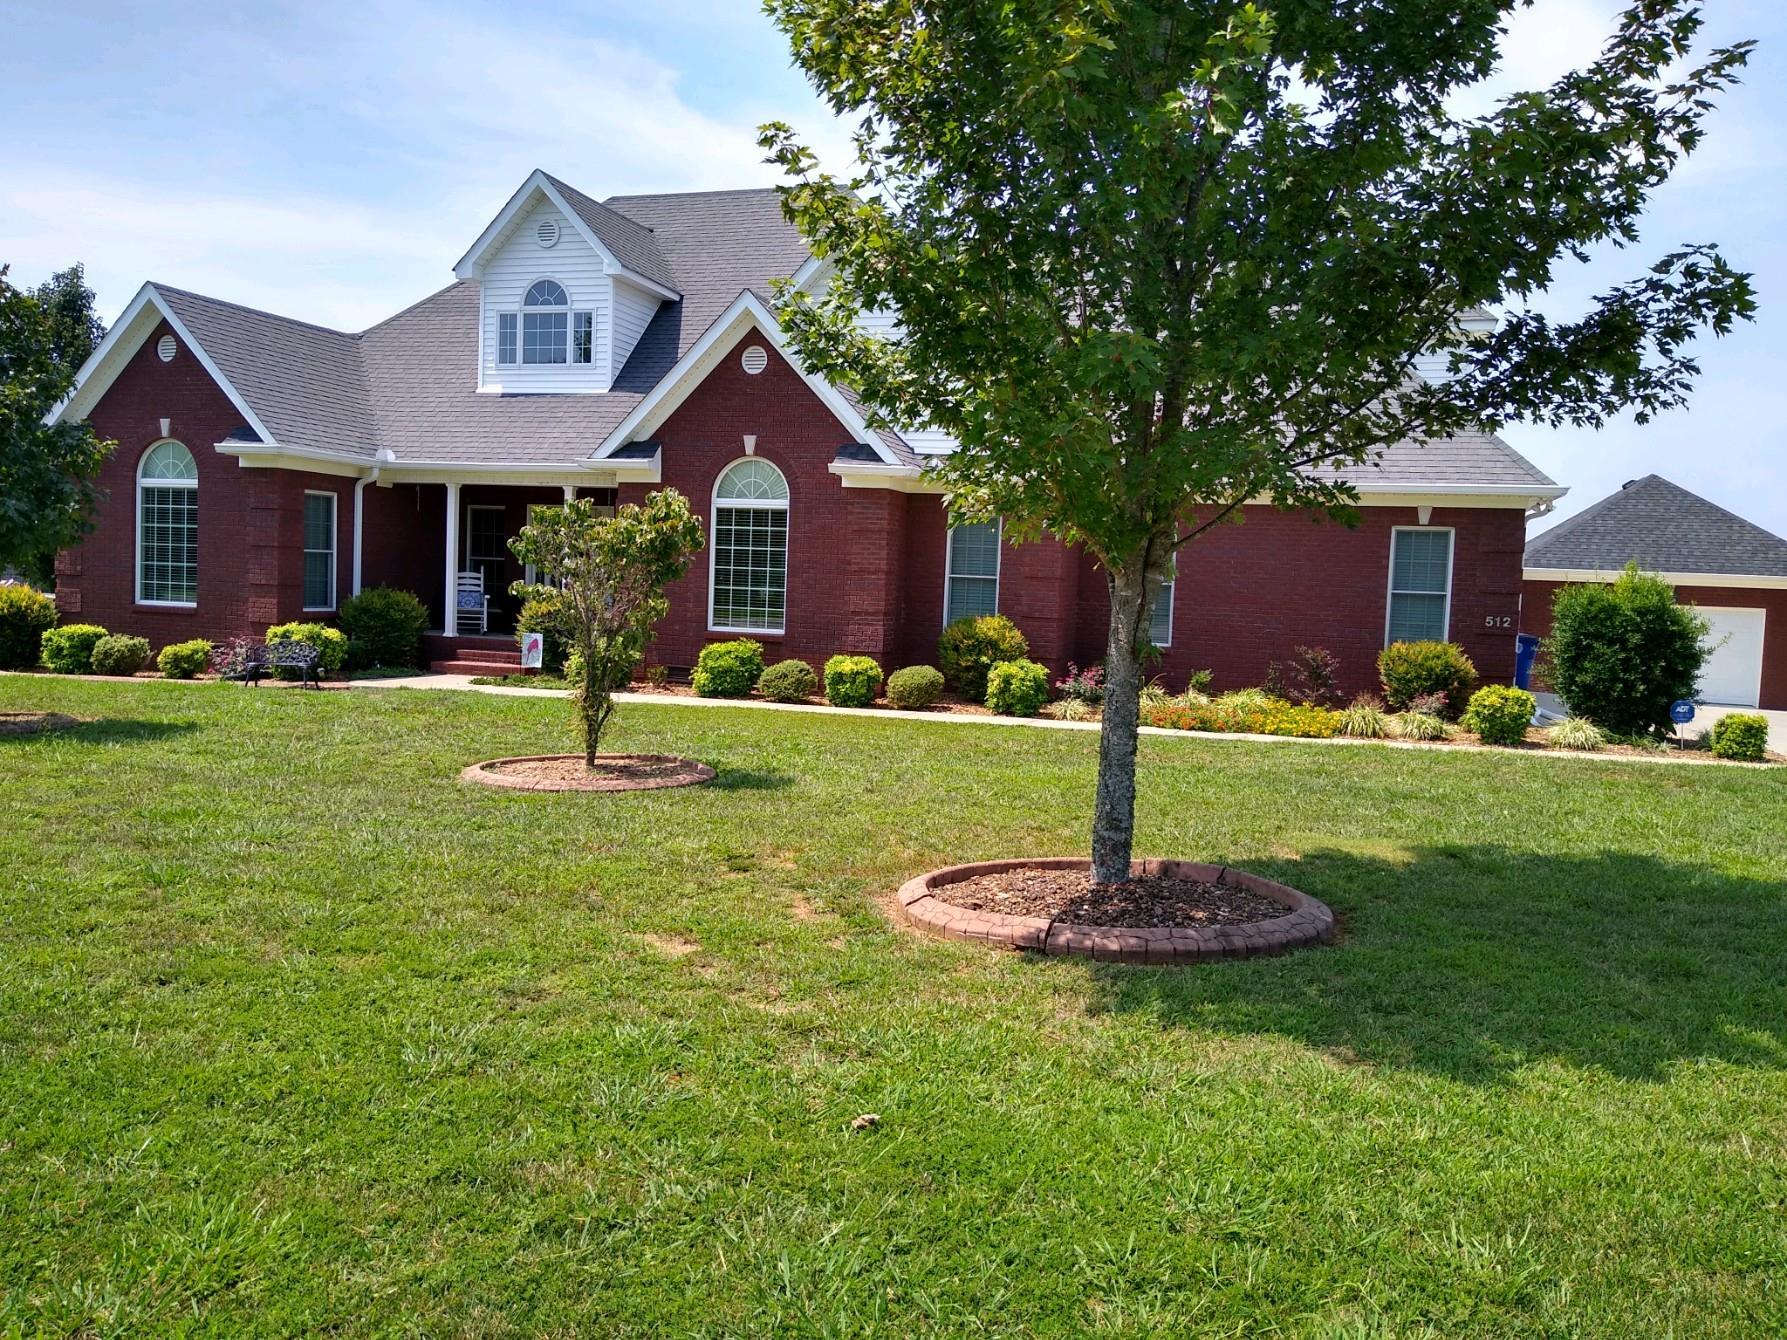 512 Apple Blossom Trl, Shelbyville, TN 37160 - Shelbyville, TN real estate listing